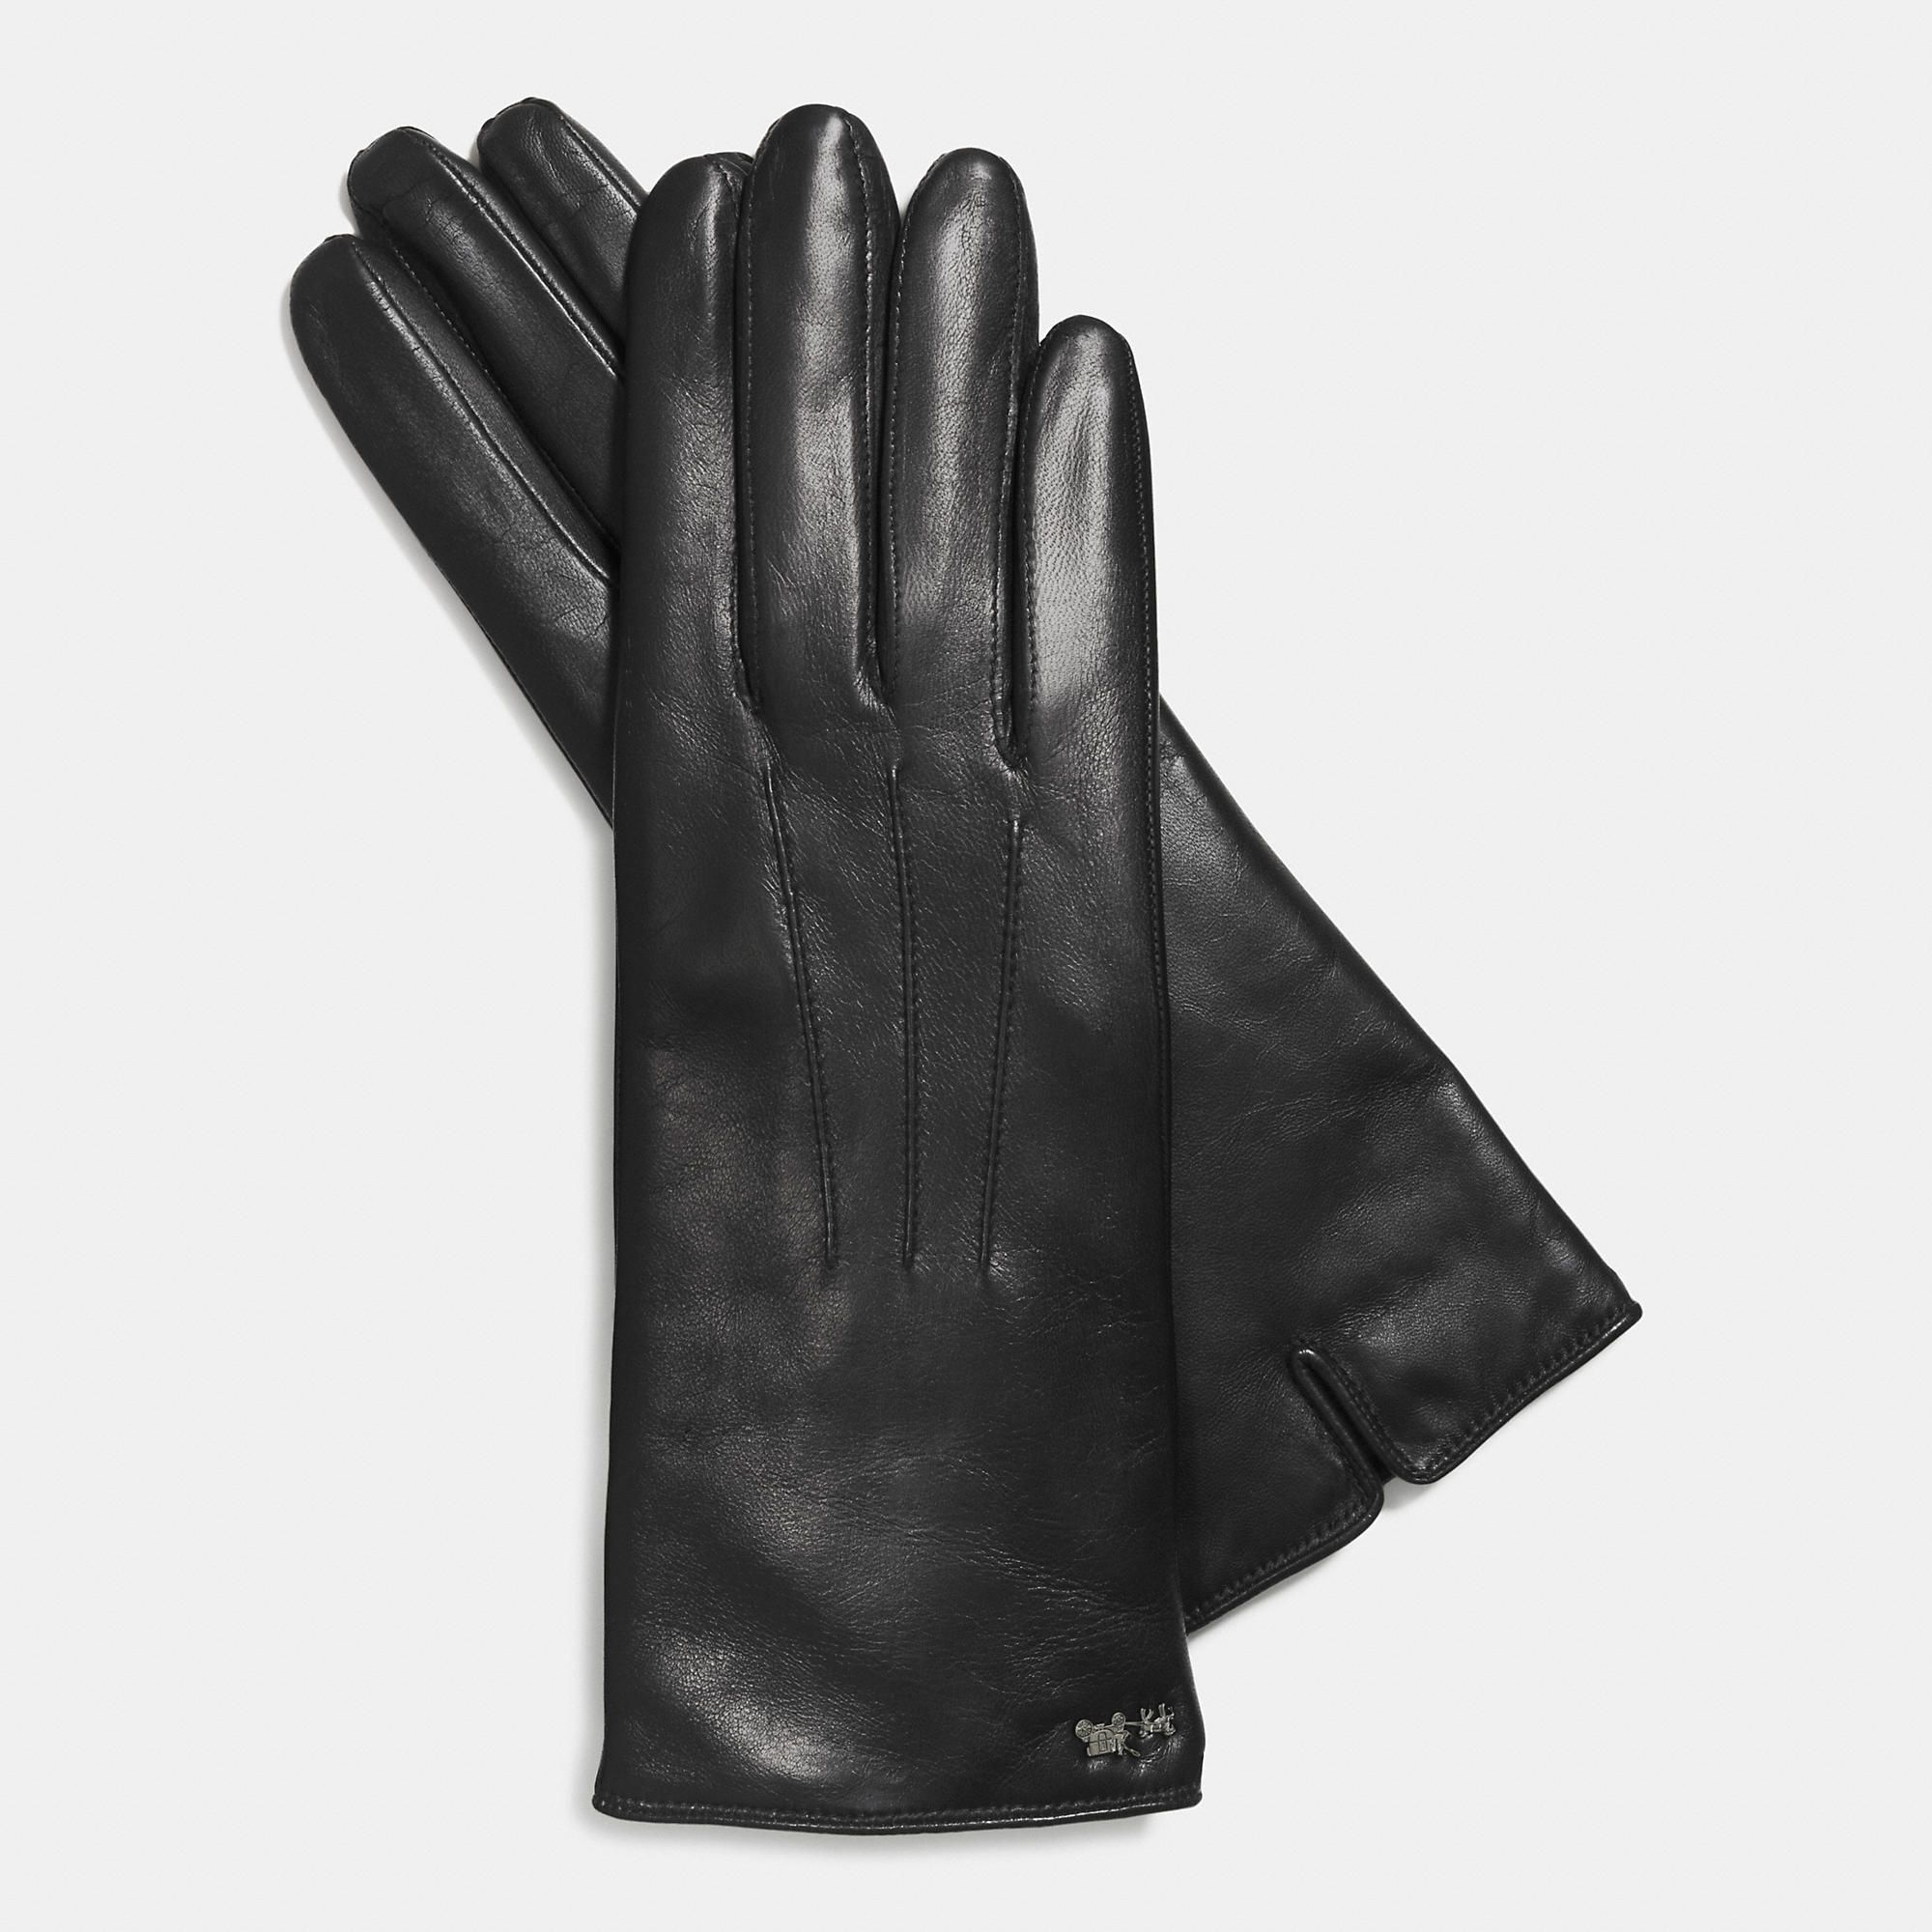 "Coach Leather Tech Glove, $74;&lt;a href=""http://www.coach.com/online/handbags/Product-coach-10551-10051-85125-en?cs=blk&amp;amp;storeId=10551&amp;amp;catalogId=10051&amp;amp;langId=-1&amp;amp;partNumber=85125_blk&amp;amp;Cid=A_L1&amp;amp;siteID=Hy3bqNL2jtQ-1RlDtpfiGMIcV1cPXiHWwQ""&gt; coach.com&lt;/a&gt;  <!--EndFragment-->"